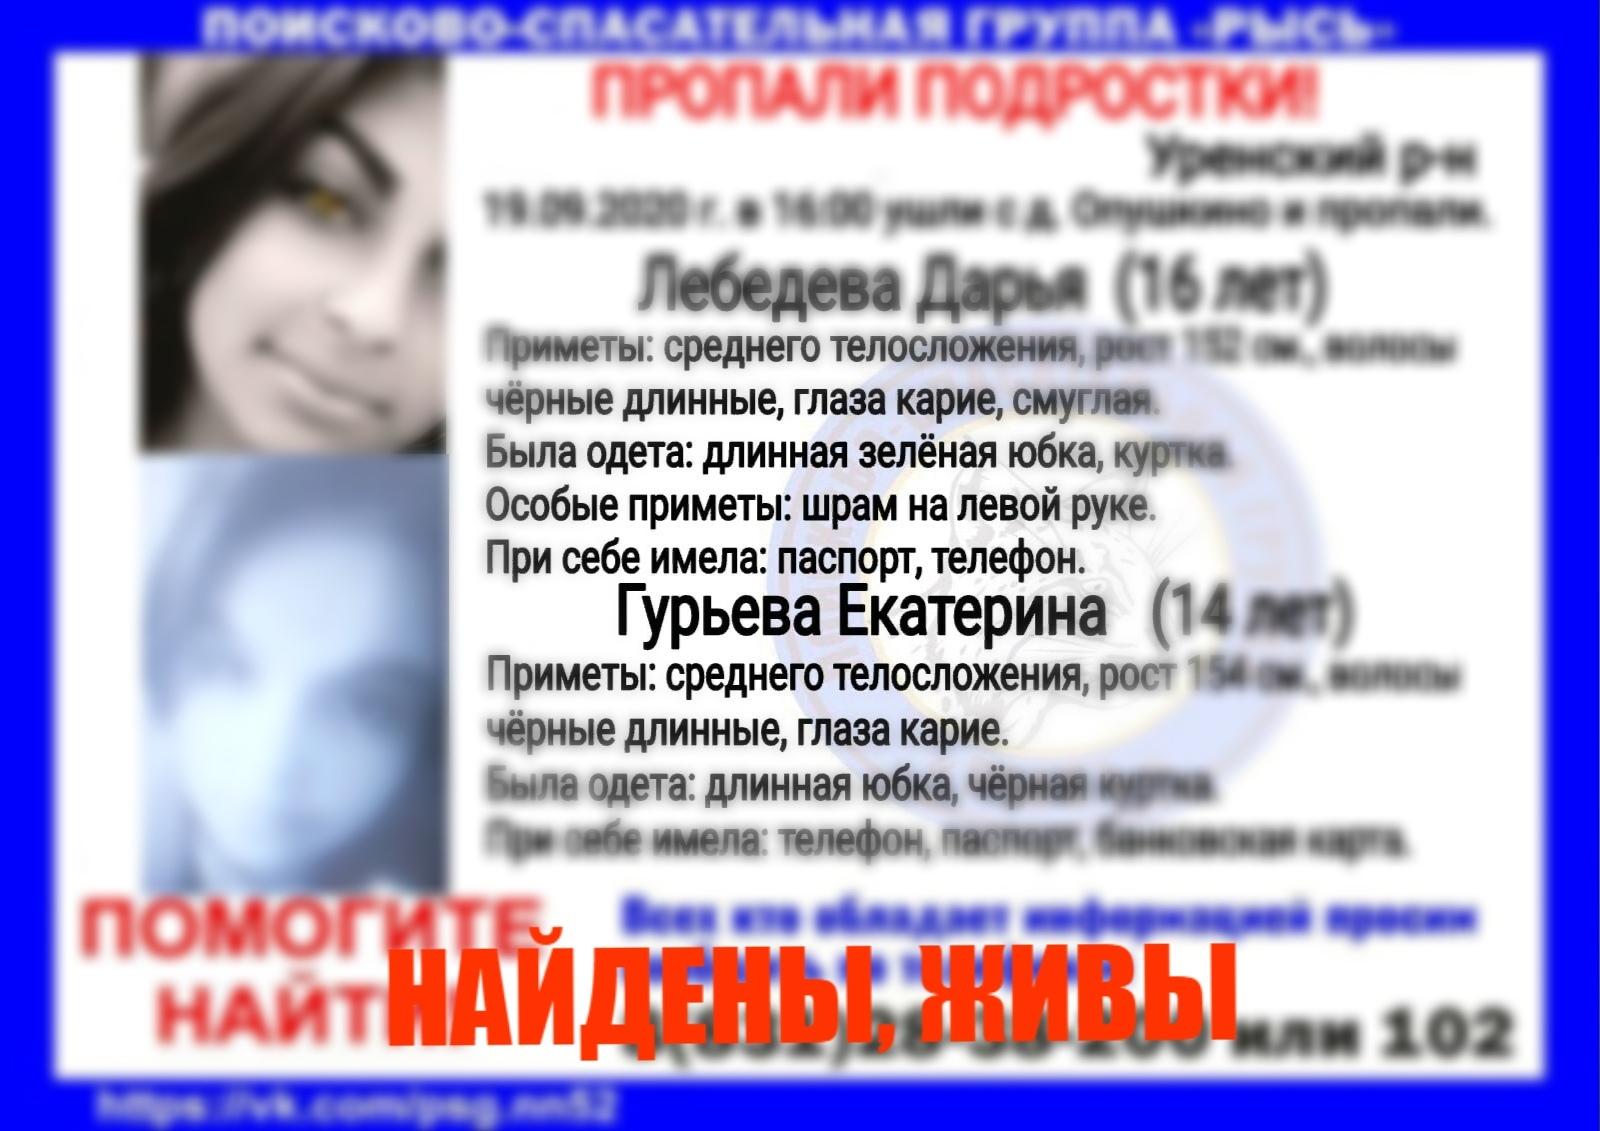 Лебедева Дарья, 16 лет, Гурьева Екатерина, 14 лет, Уренский р-он, д. Опушкино